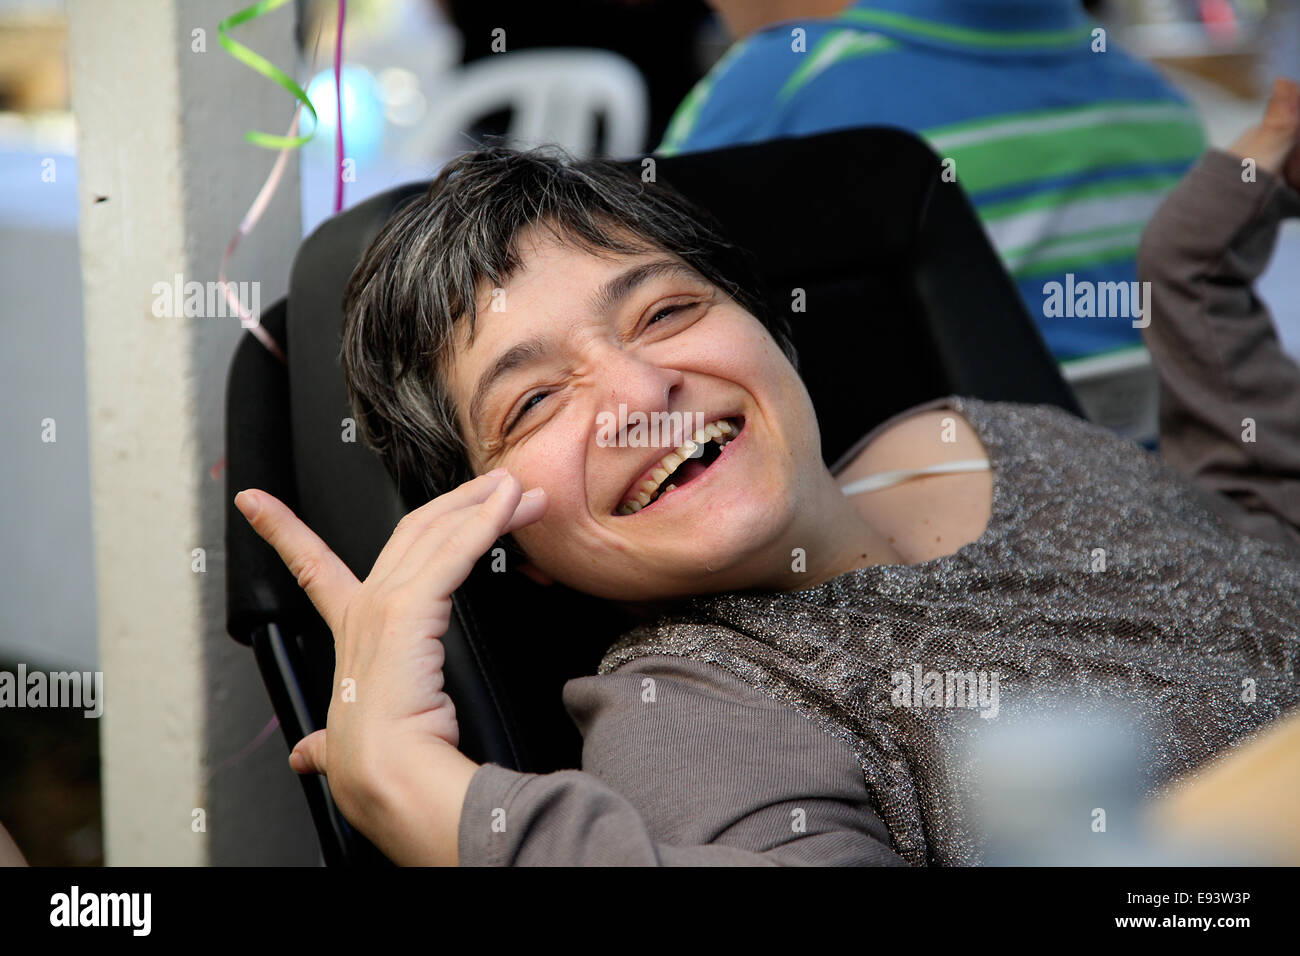 Cyprus. 18th Oct, 2014. A woman with disabilites smiling in the yard of Presidential for Radiomarathonios. Radiomarathonios - Stock Image